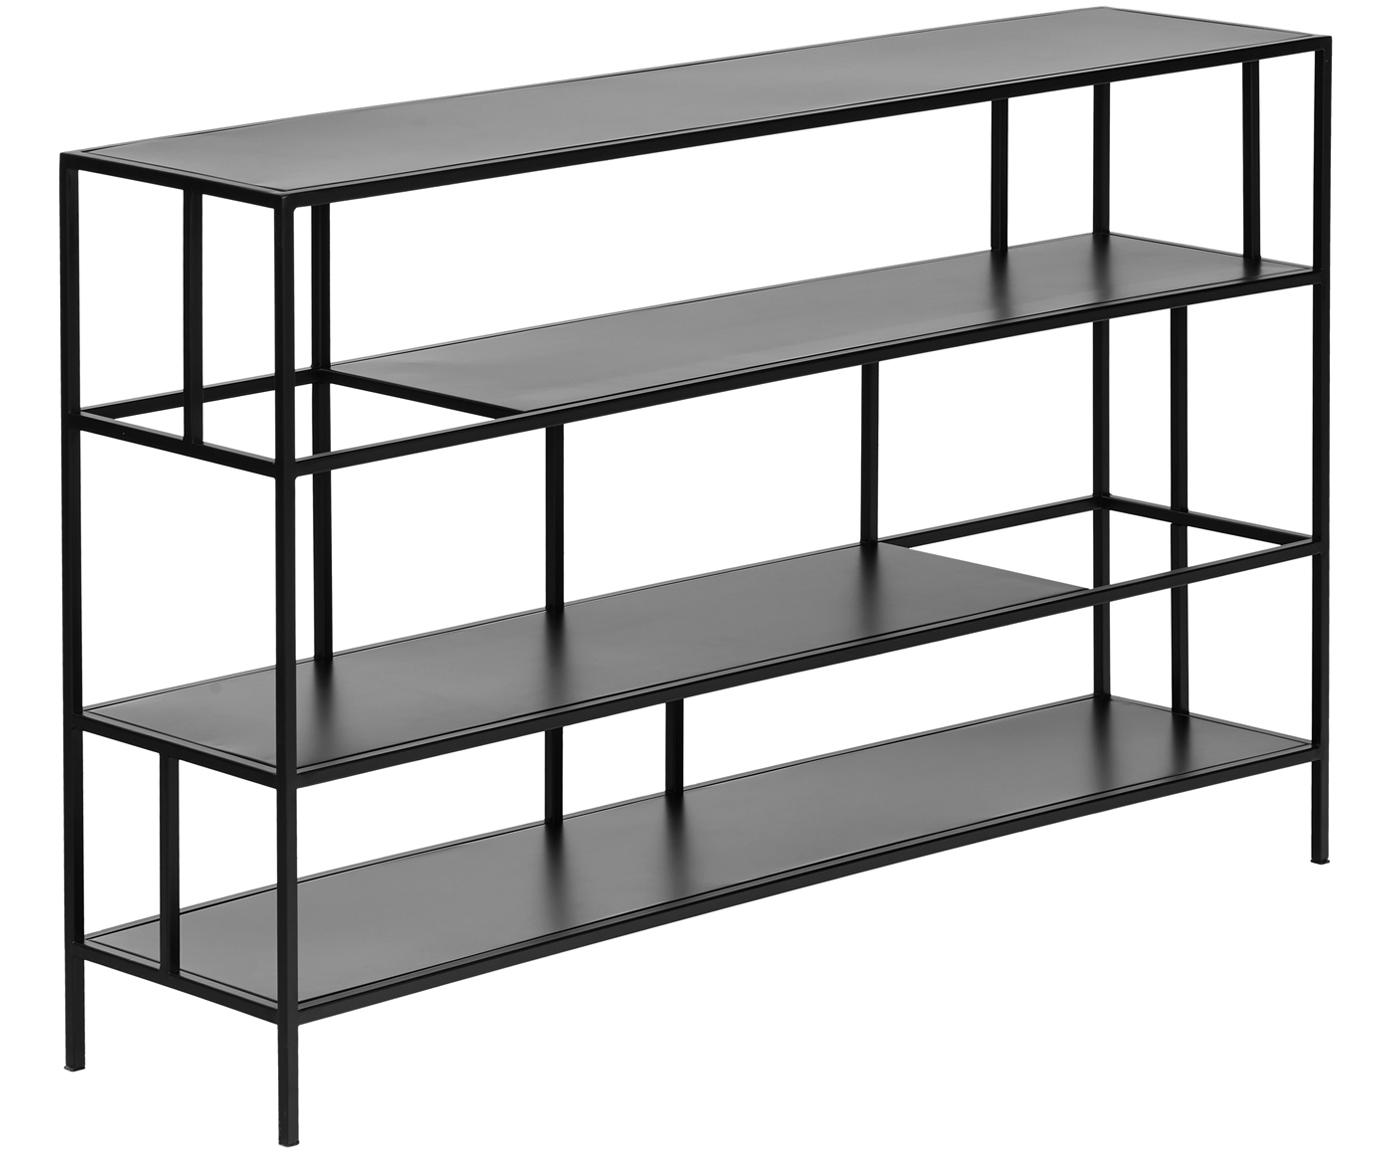 Metallregal Sheldon in Schwarz, Metall, pulverbeschichtet, Schwarz, matt, 120 x 74 cm